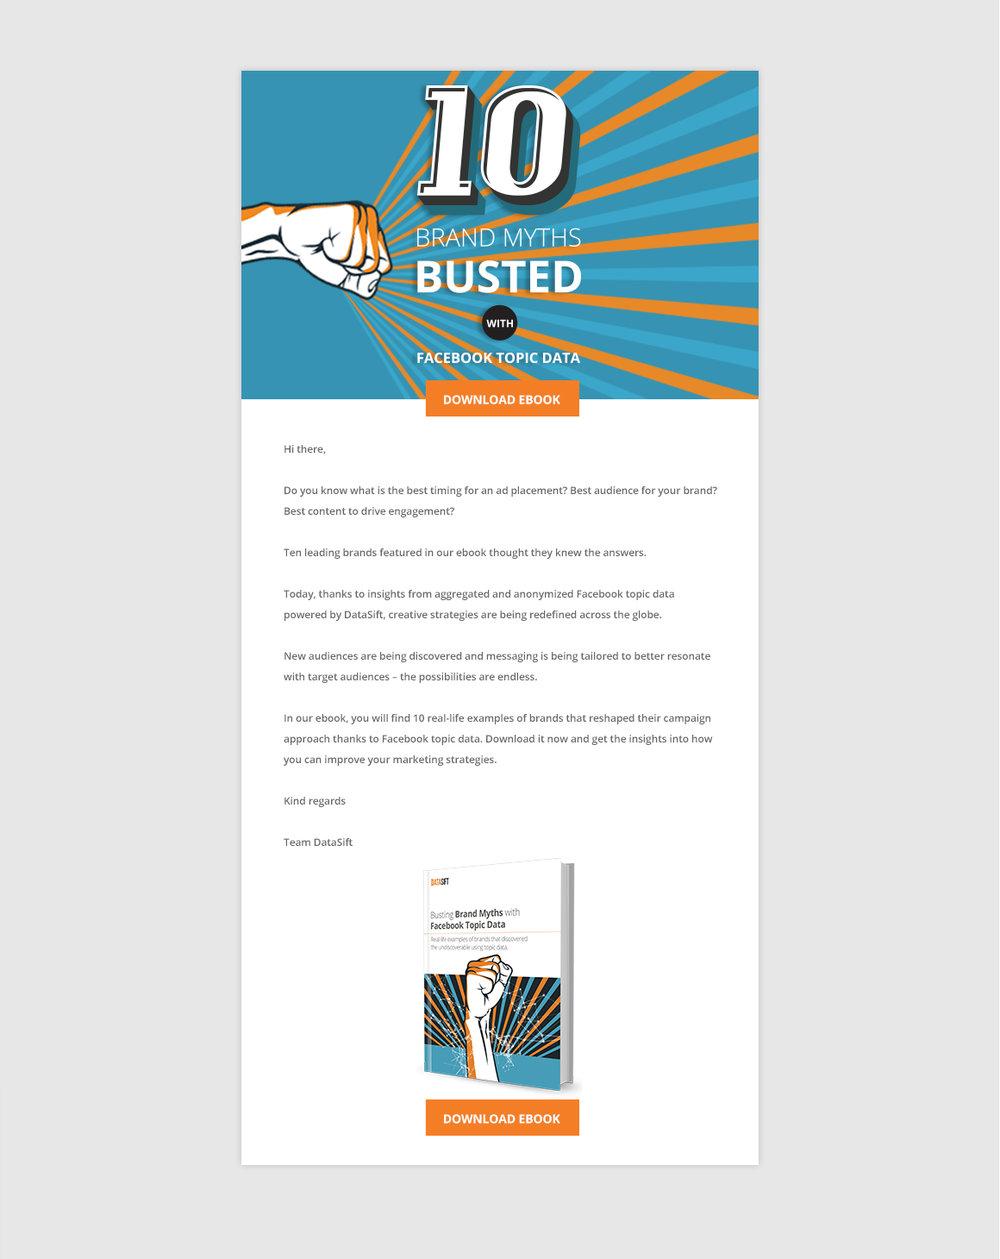 datasift_email_blast.jpg